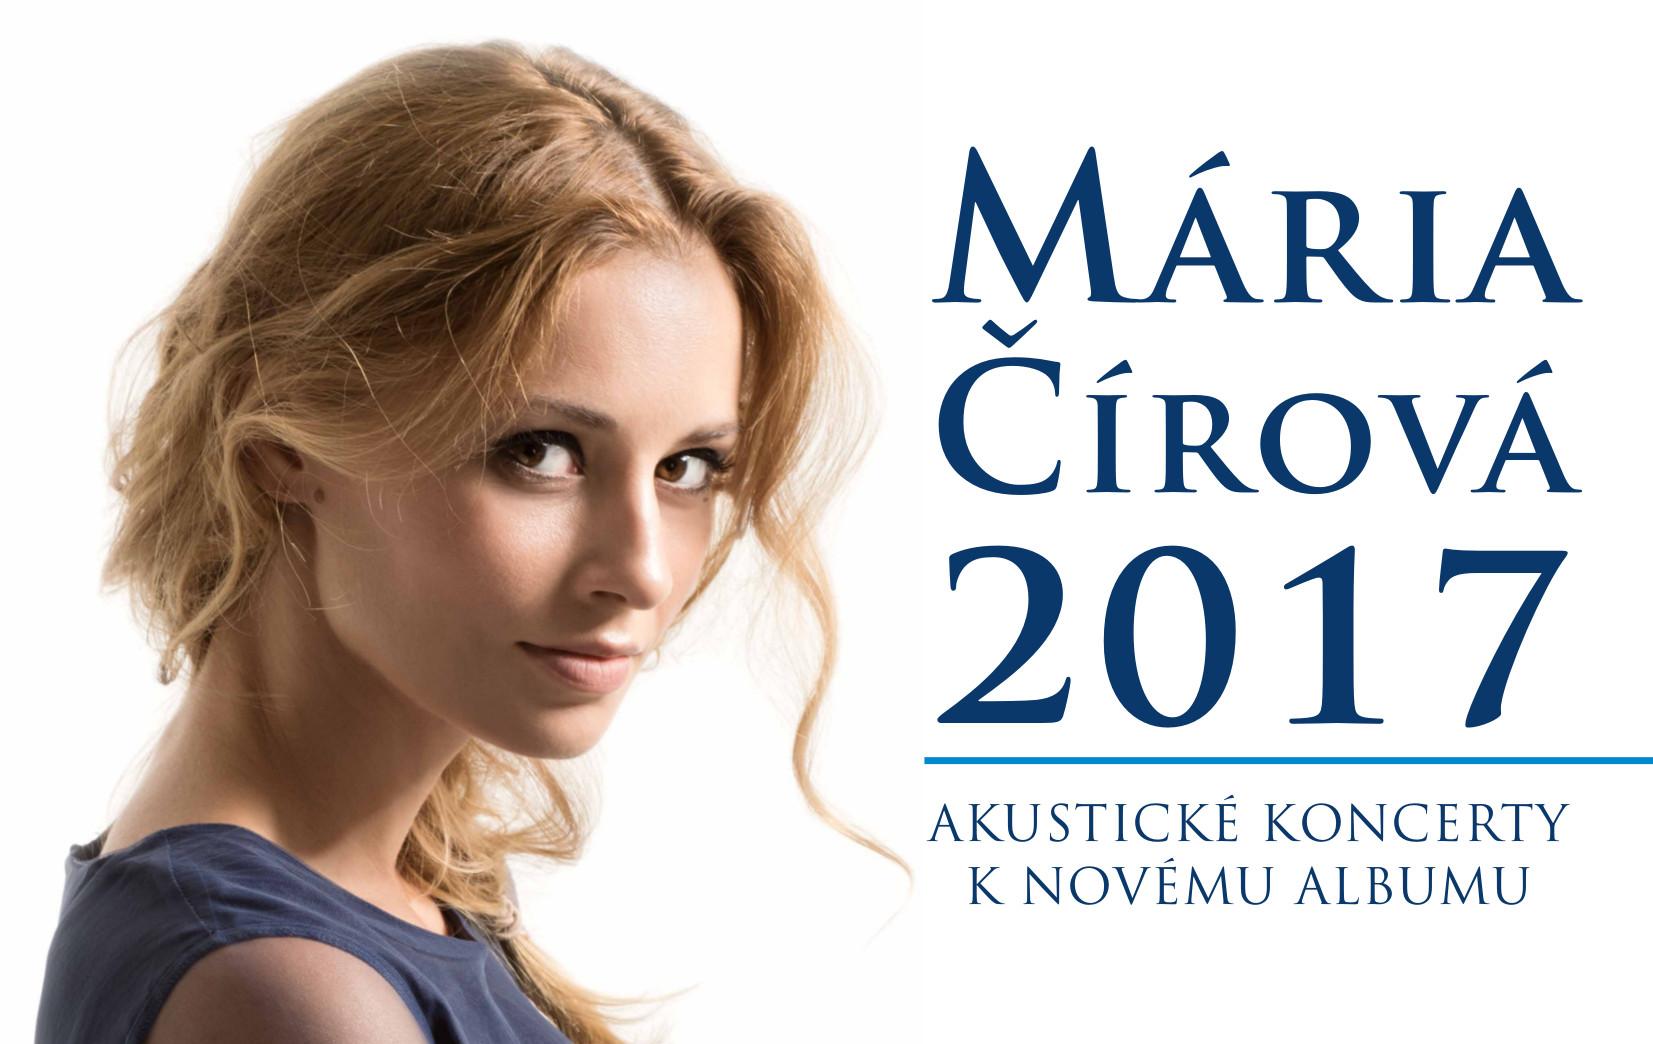 efa47232d016 MÁRIA ČÍROVÁ  2017 Akustický koncert - Katalóg firiem